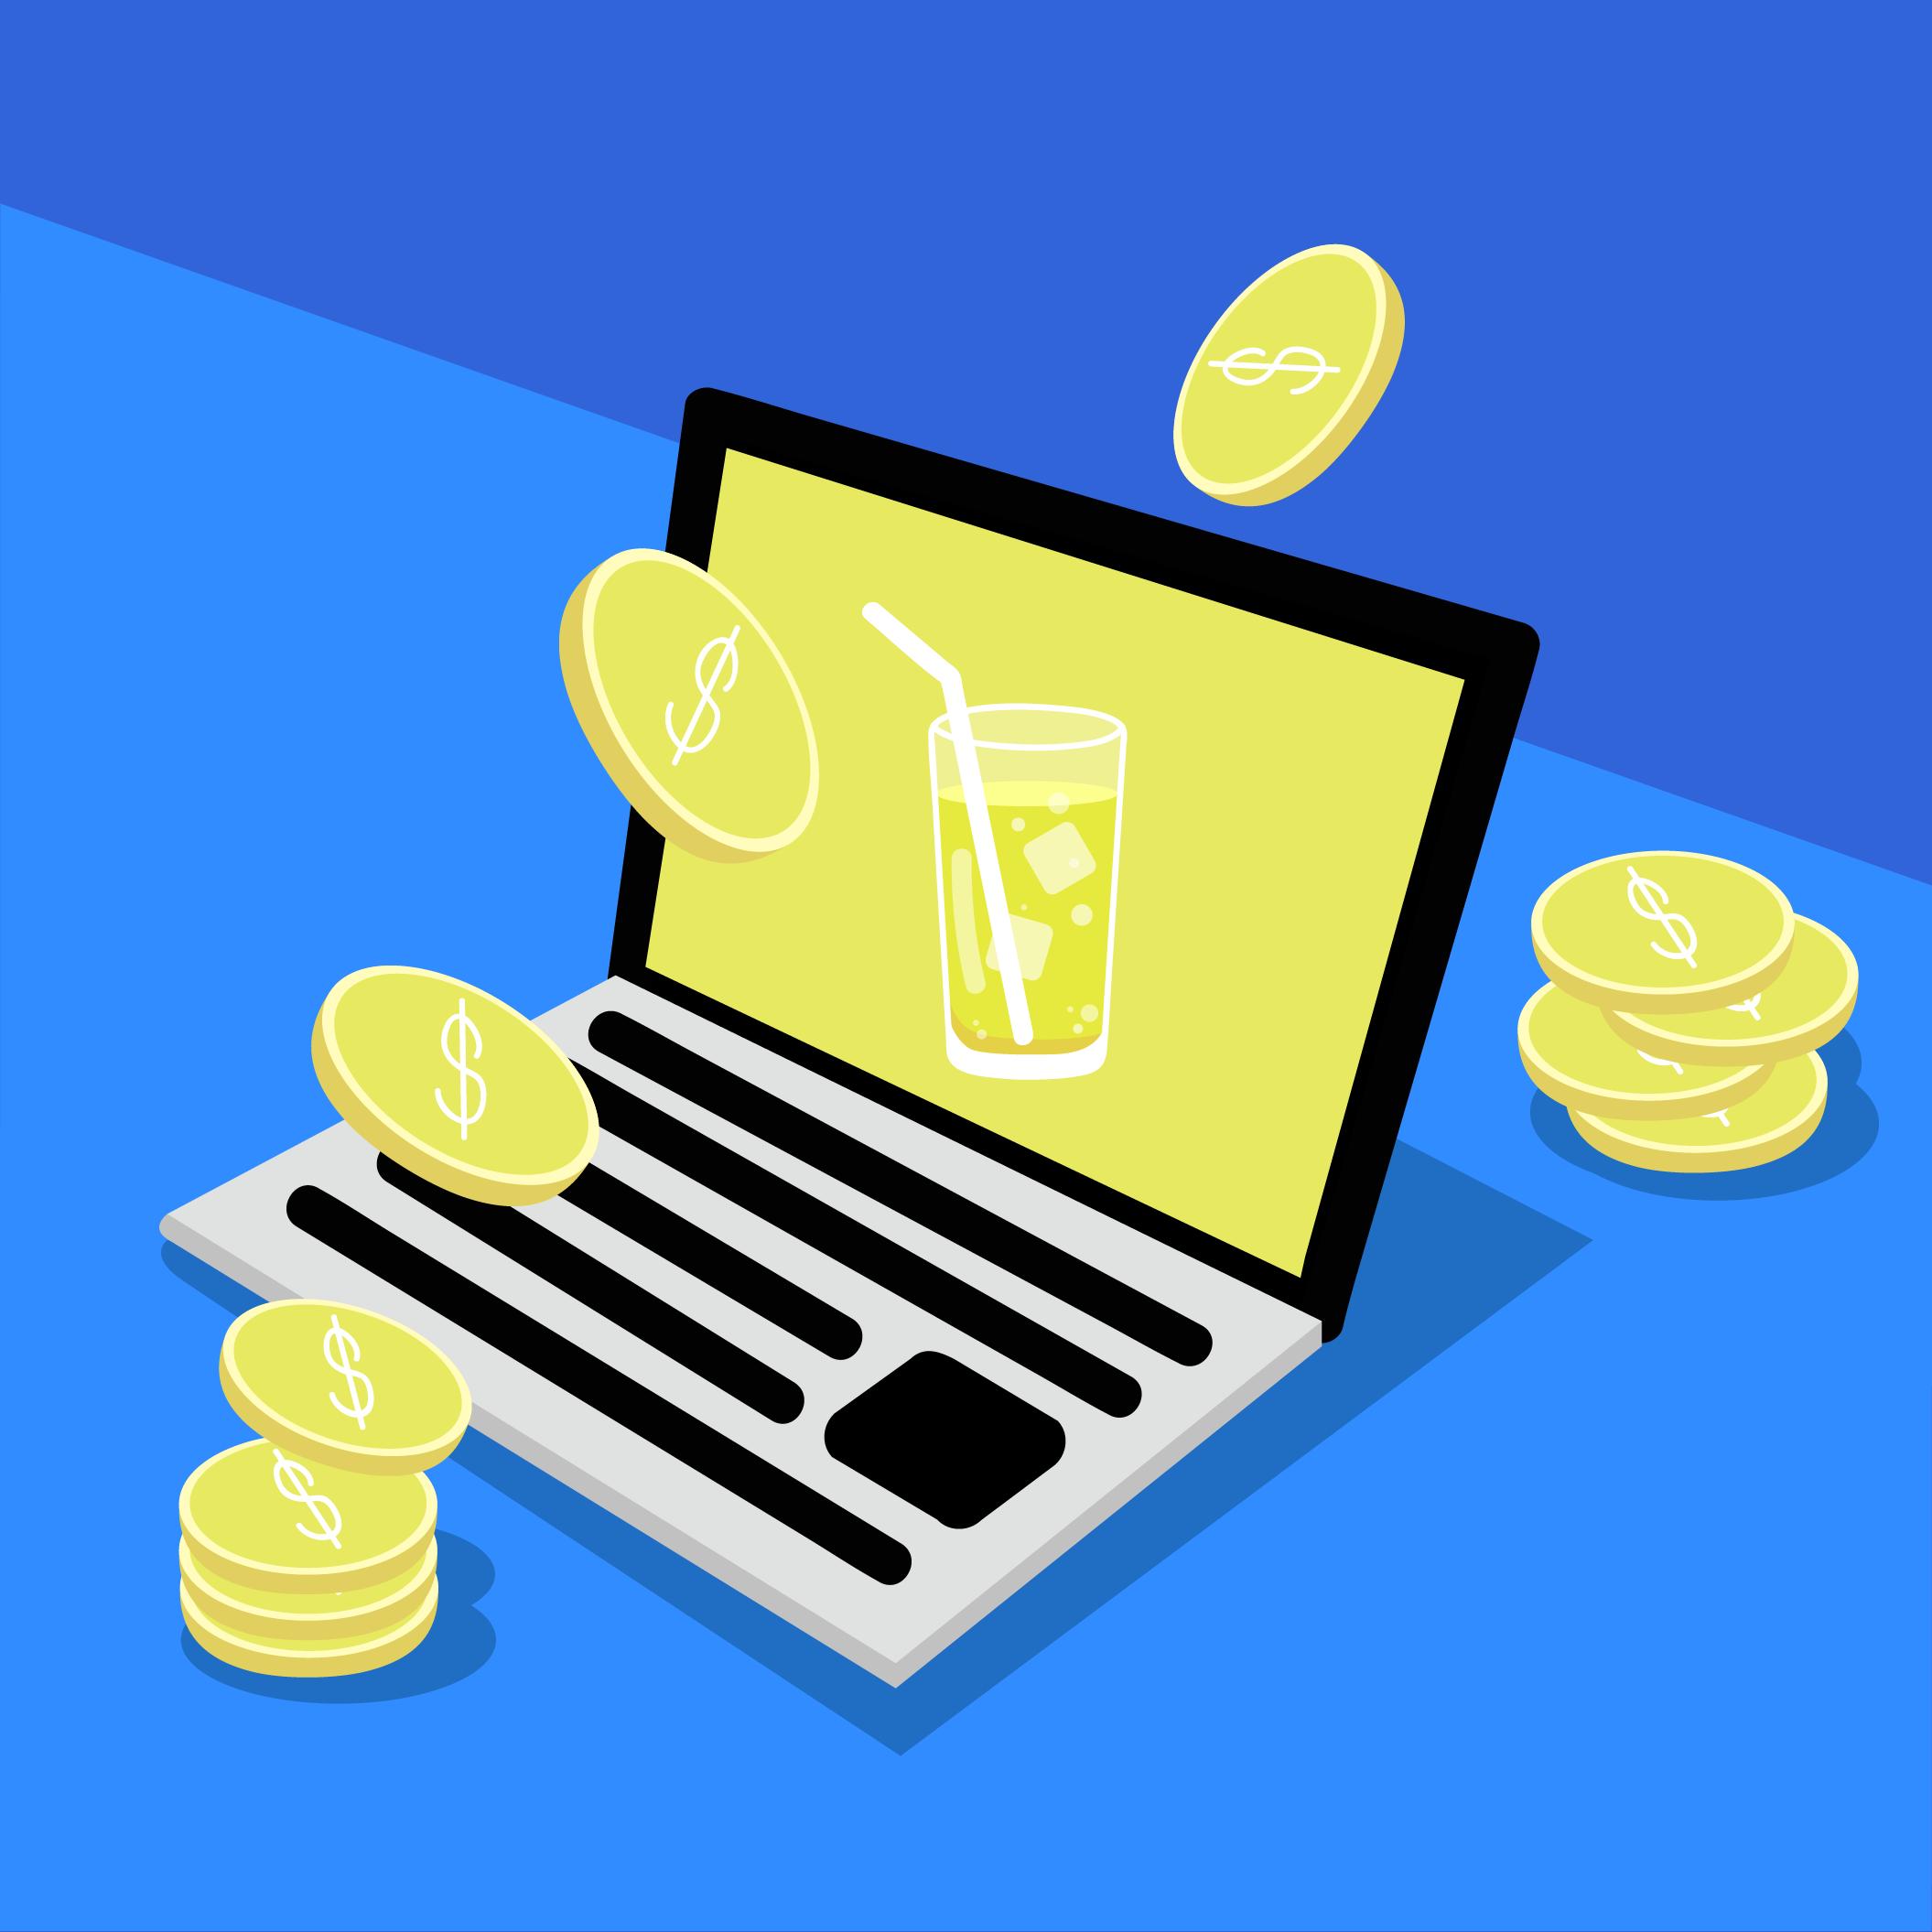 Marketing-ROI-Steigerung durch Plug-and-Play